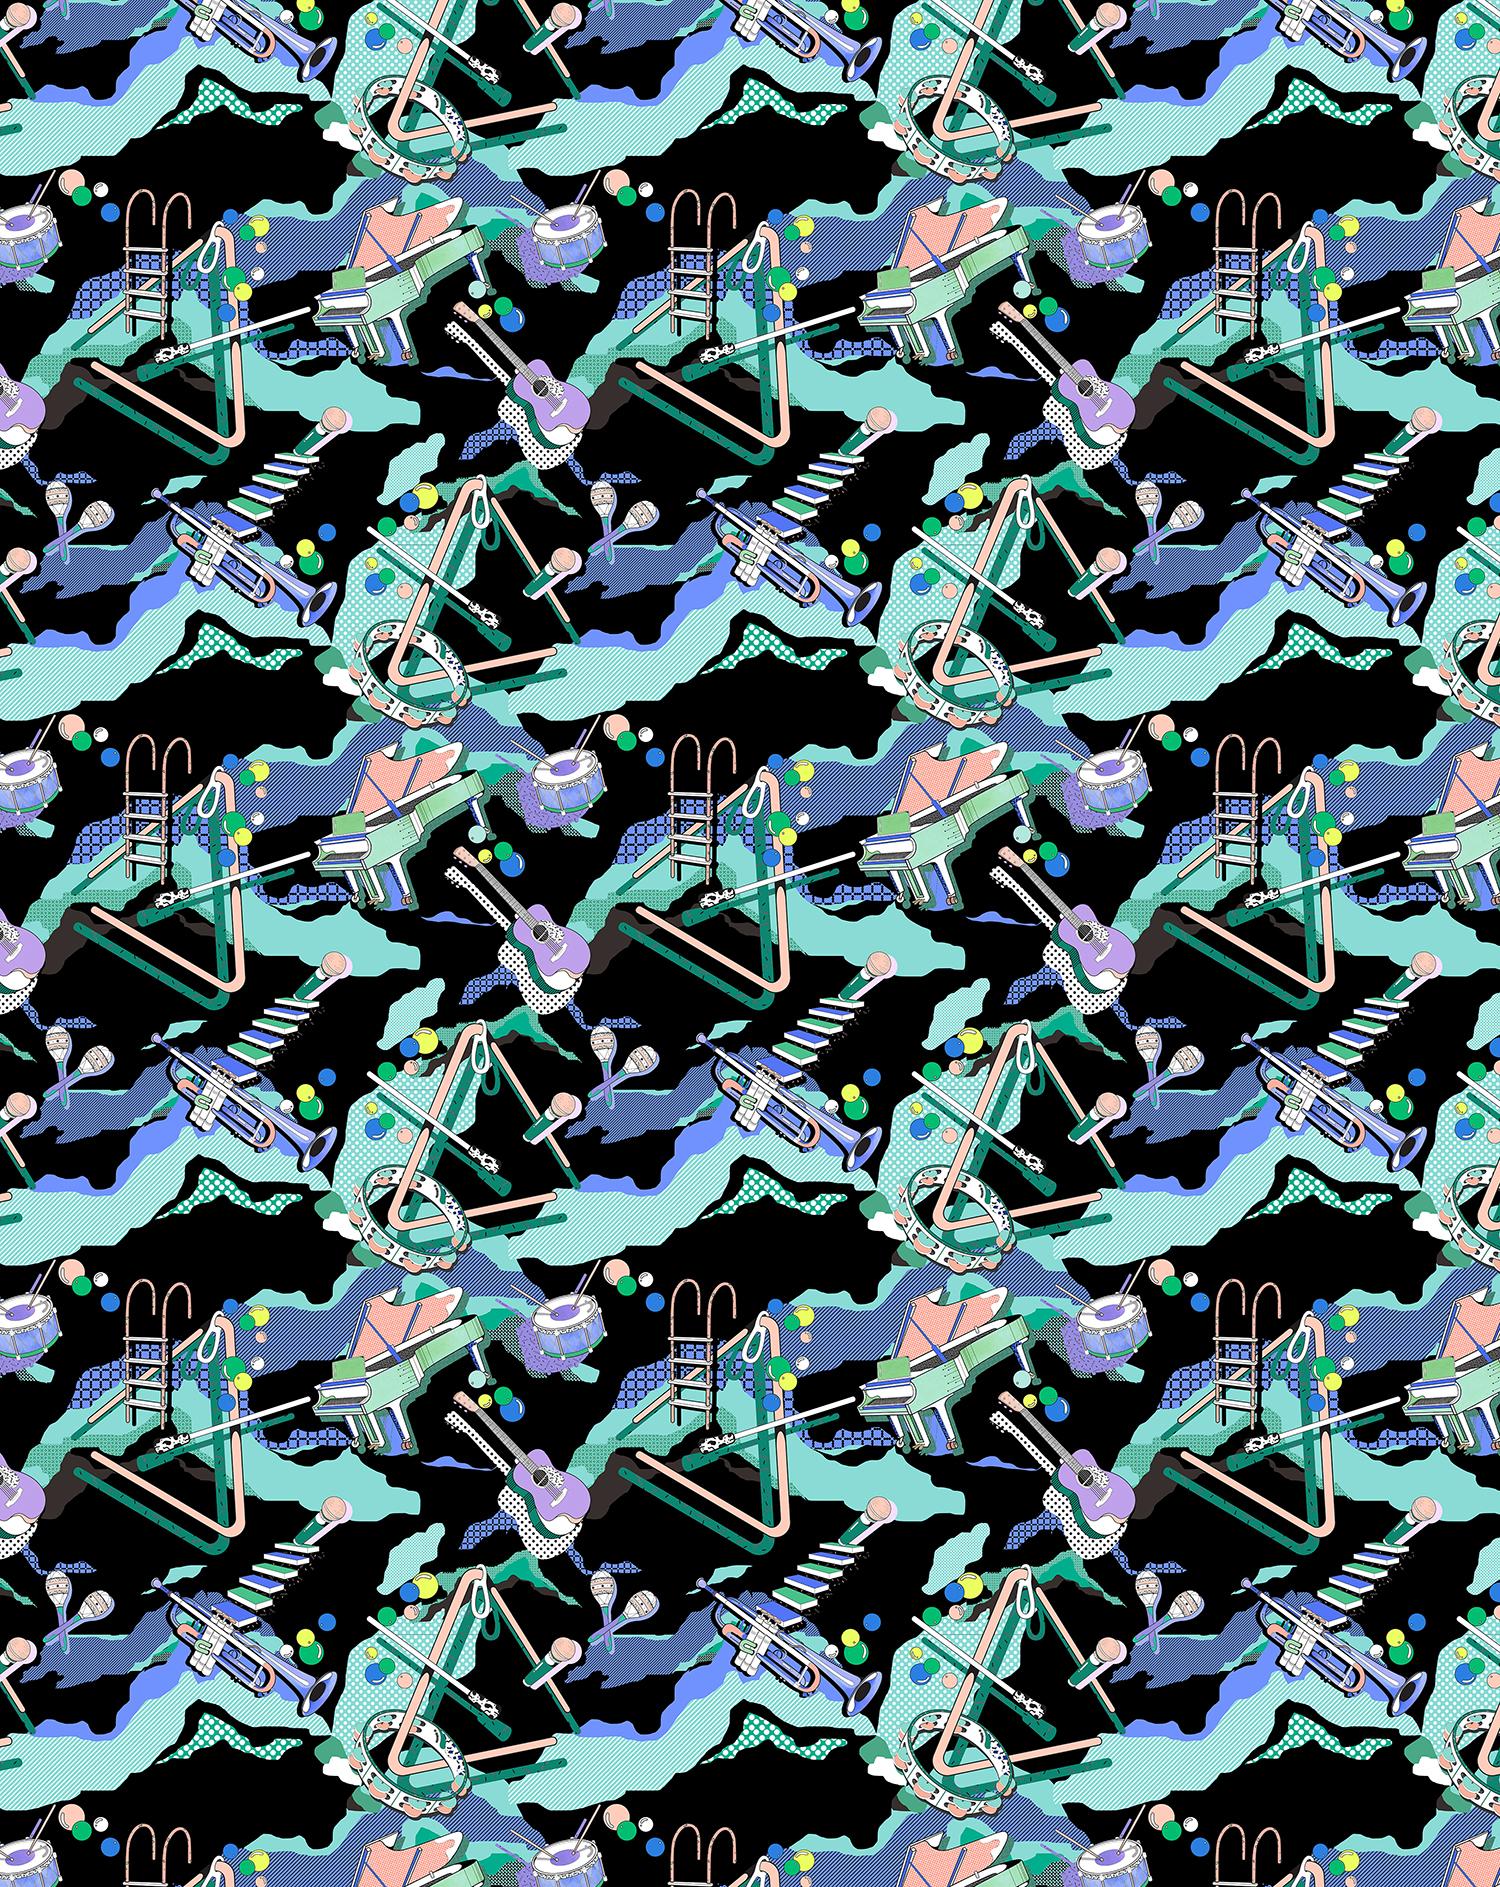 PommeChan_Pattern_Music black_Lowres_15x15.jpg